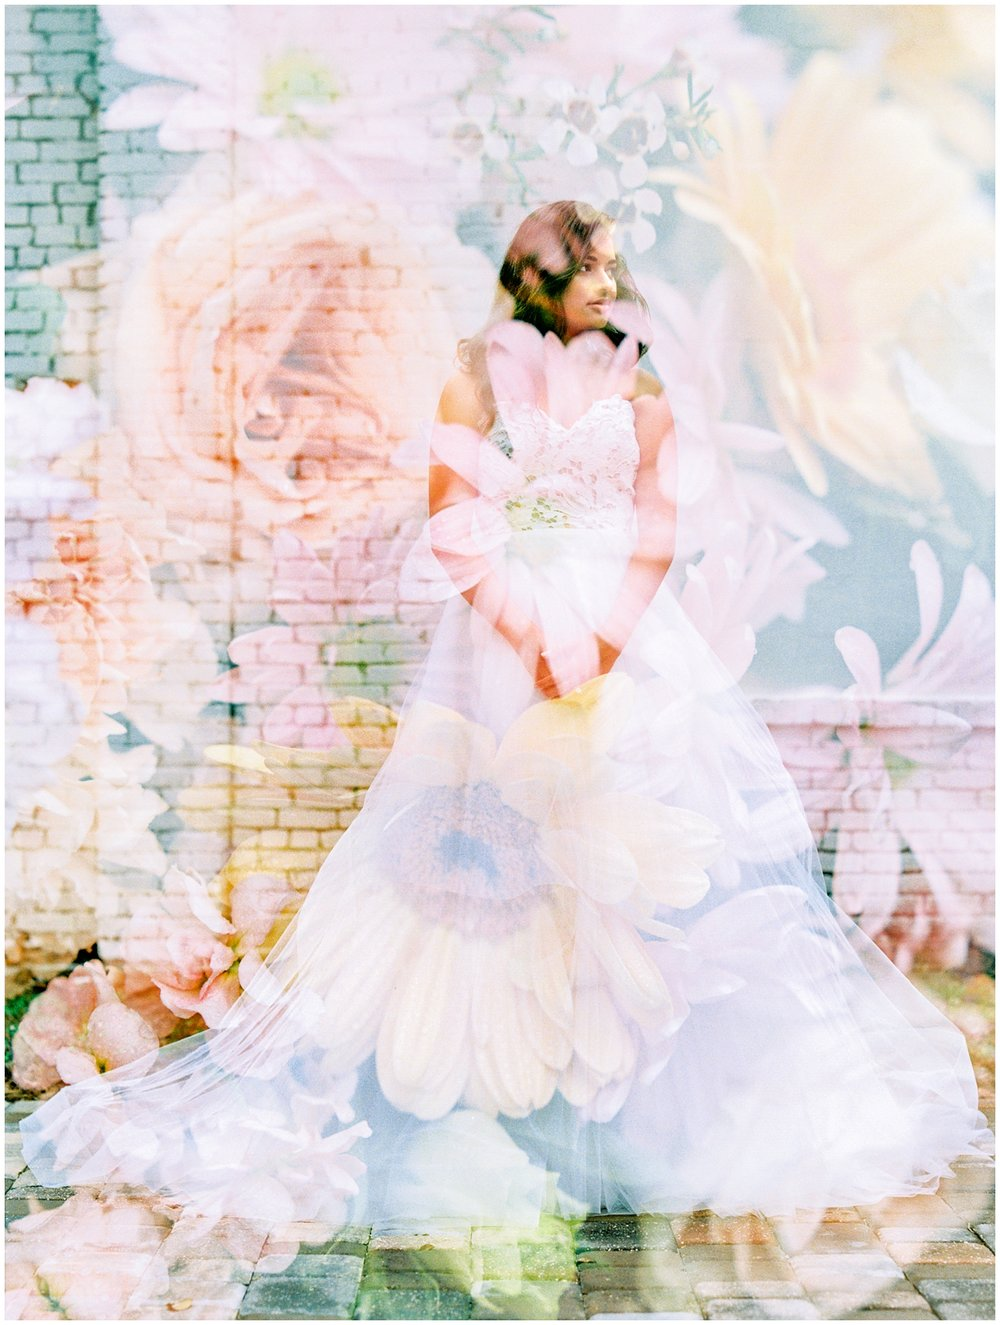 Lisa Silva Photography- Ponte Vedra Beach and Jacksonville, Florida Fine Art Film Wedding Photography- Spring Bridal Shoot at Ellie's Garden in San Marco, Jacksonville_0032.jpg